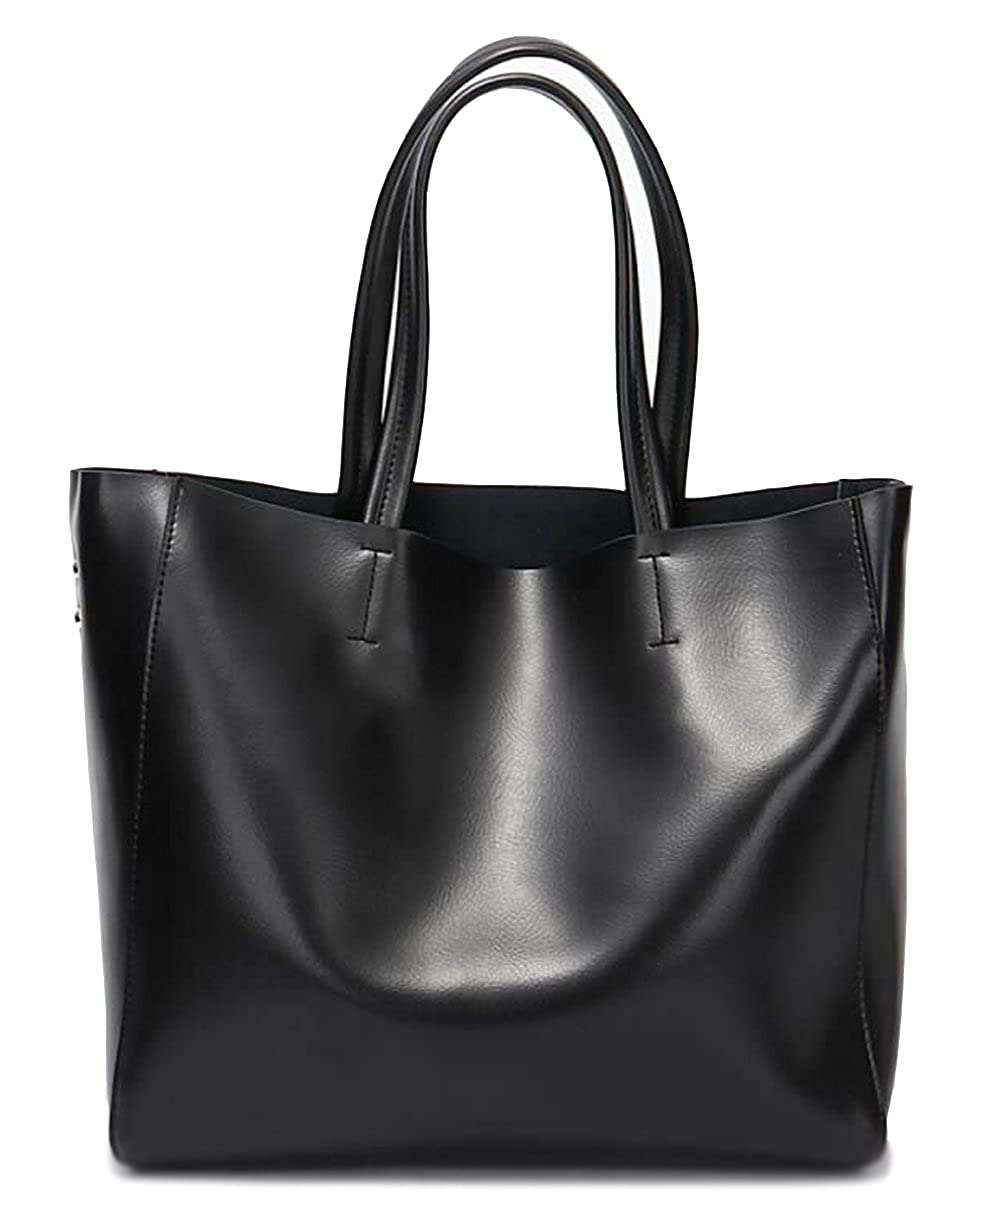 b64535311b83 Amazon.com  Covelin Women s Handbag Genuine Soft Leather Tote Shoulder Bag  Hot Black  Shoes